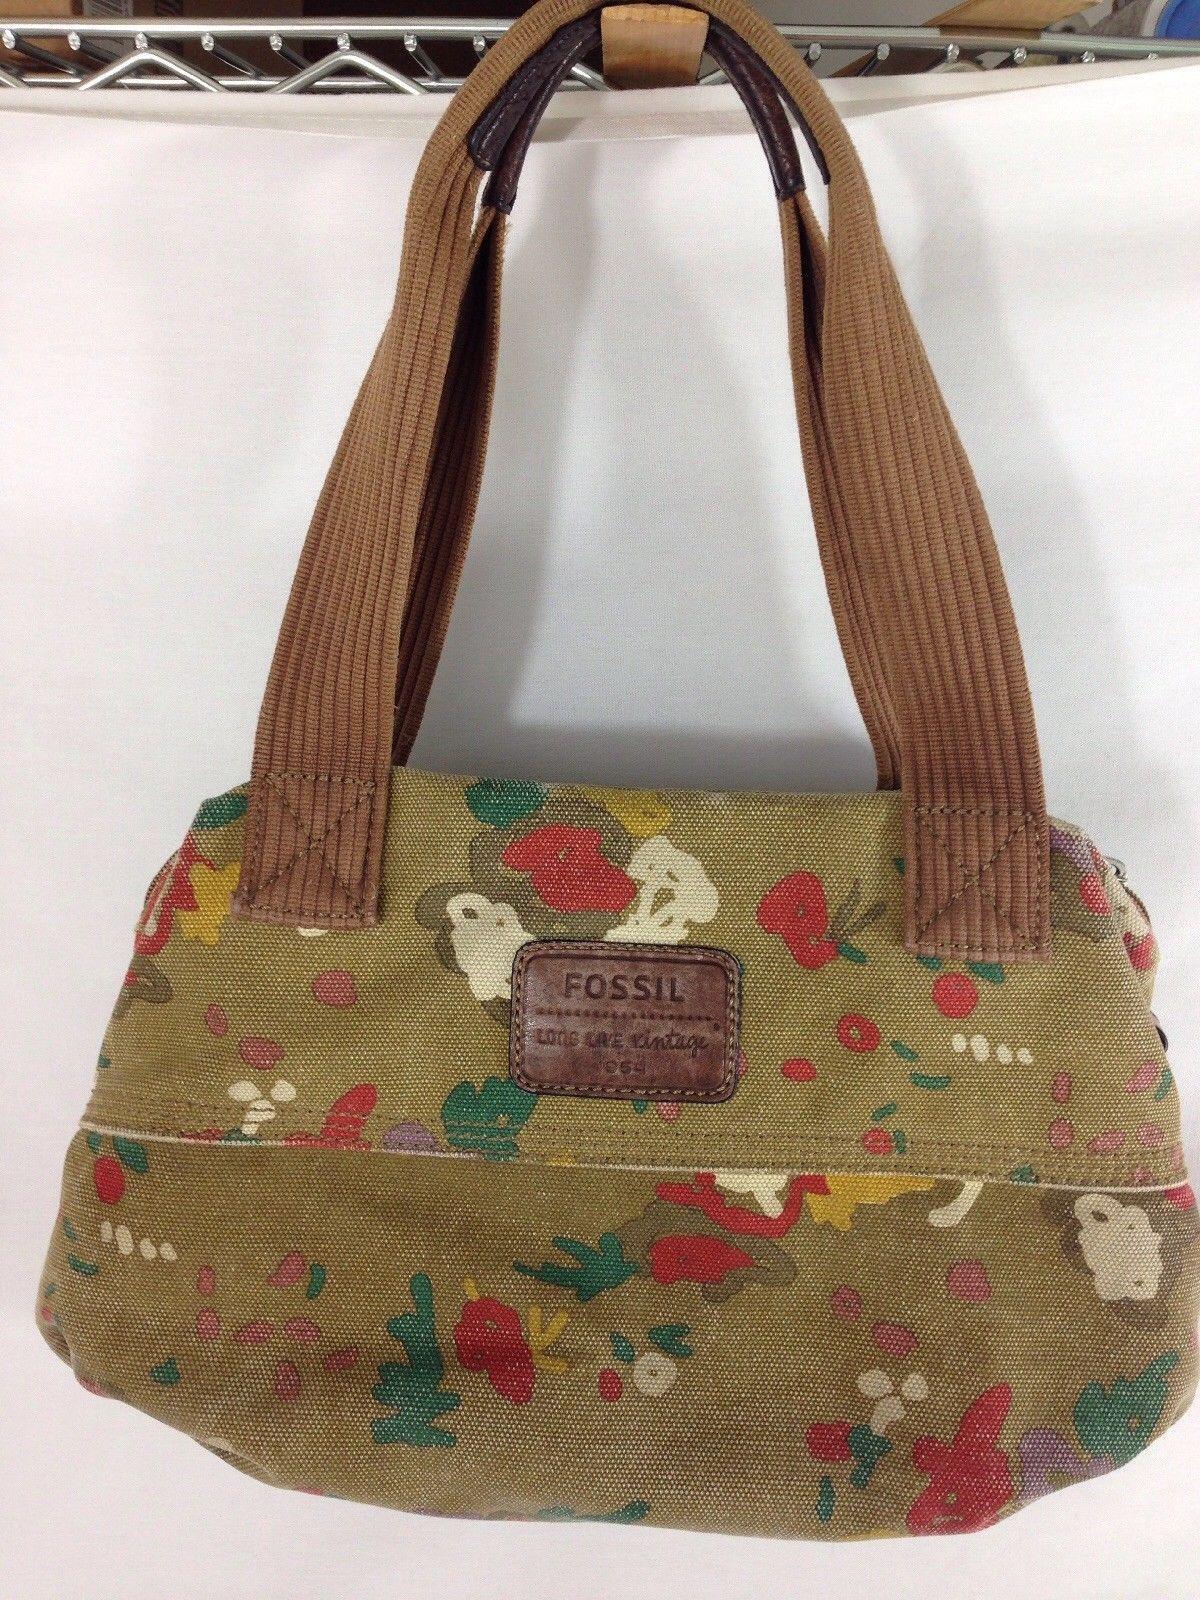 Fossil Handbag Distress Canvas Leather Boho Satchel Long Live Vintage 0591201 Ebay